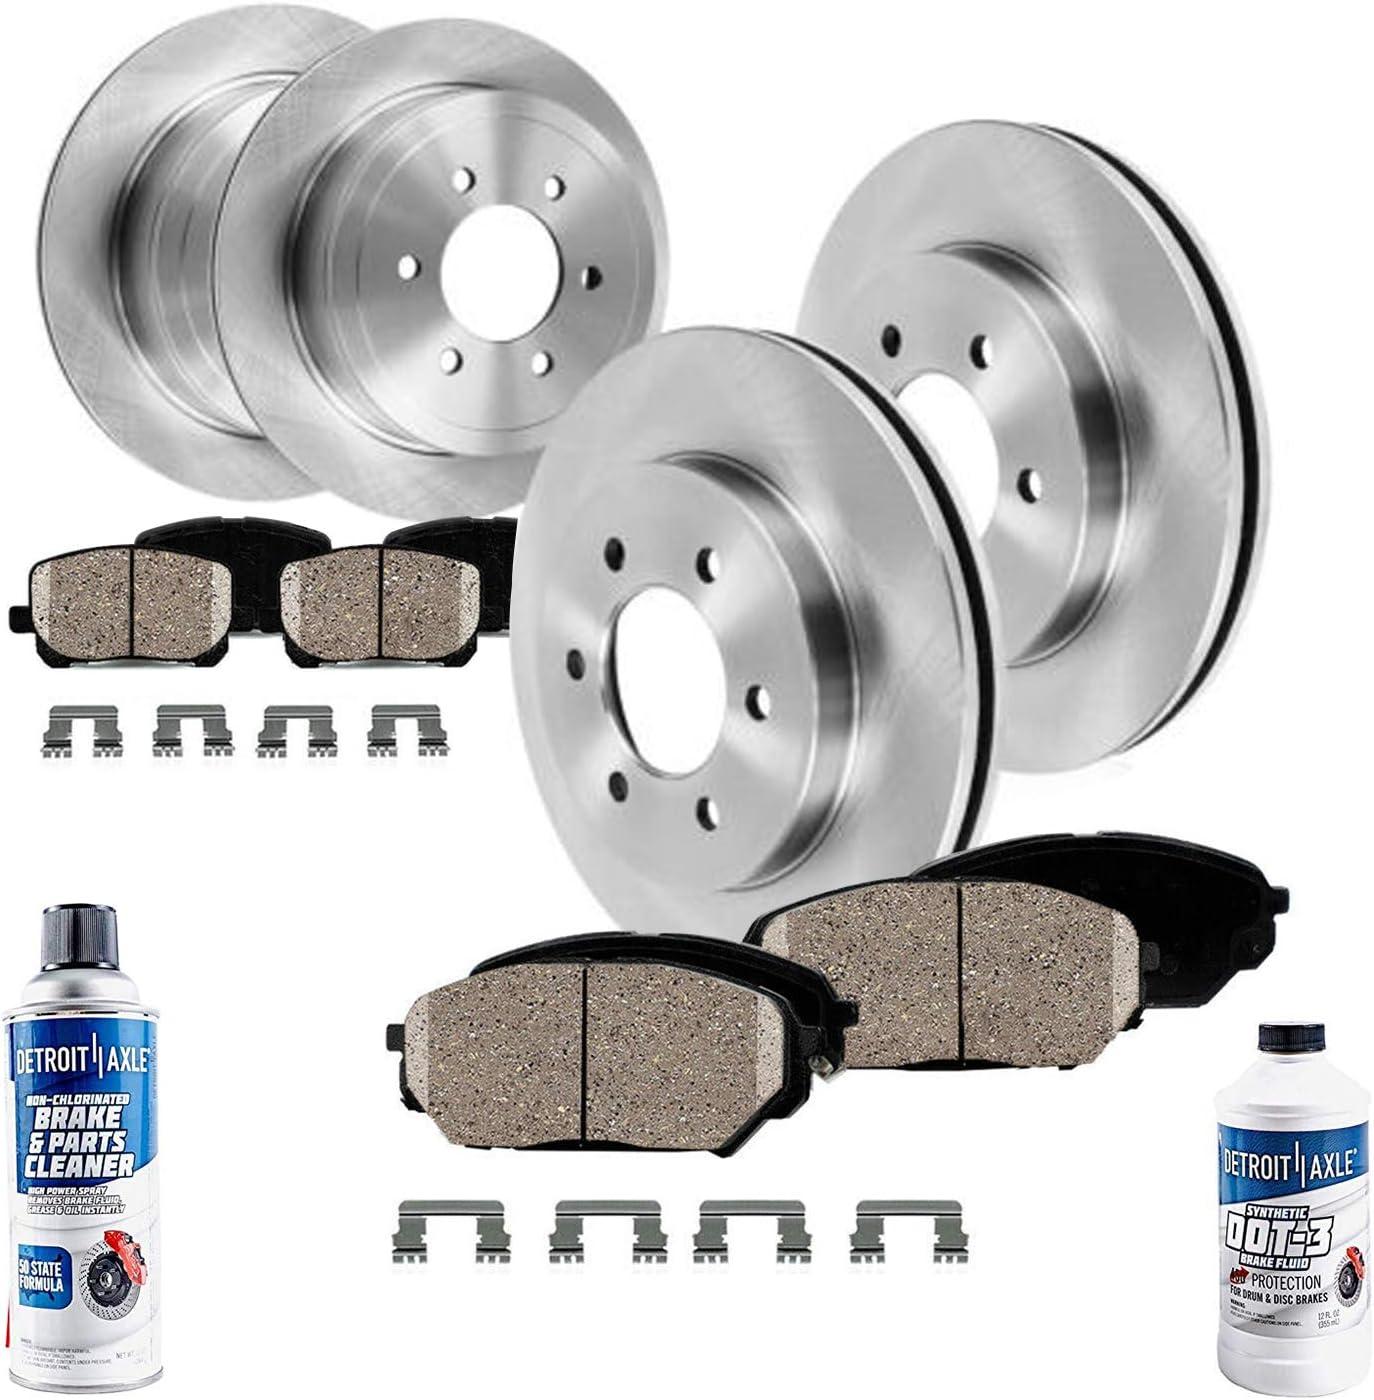 350mm 13.78 Premium FRONT Brake Rotors for Infiniti Nissan Titan QX56 Armada Detroit Axle